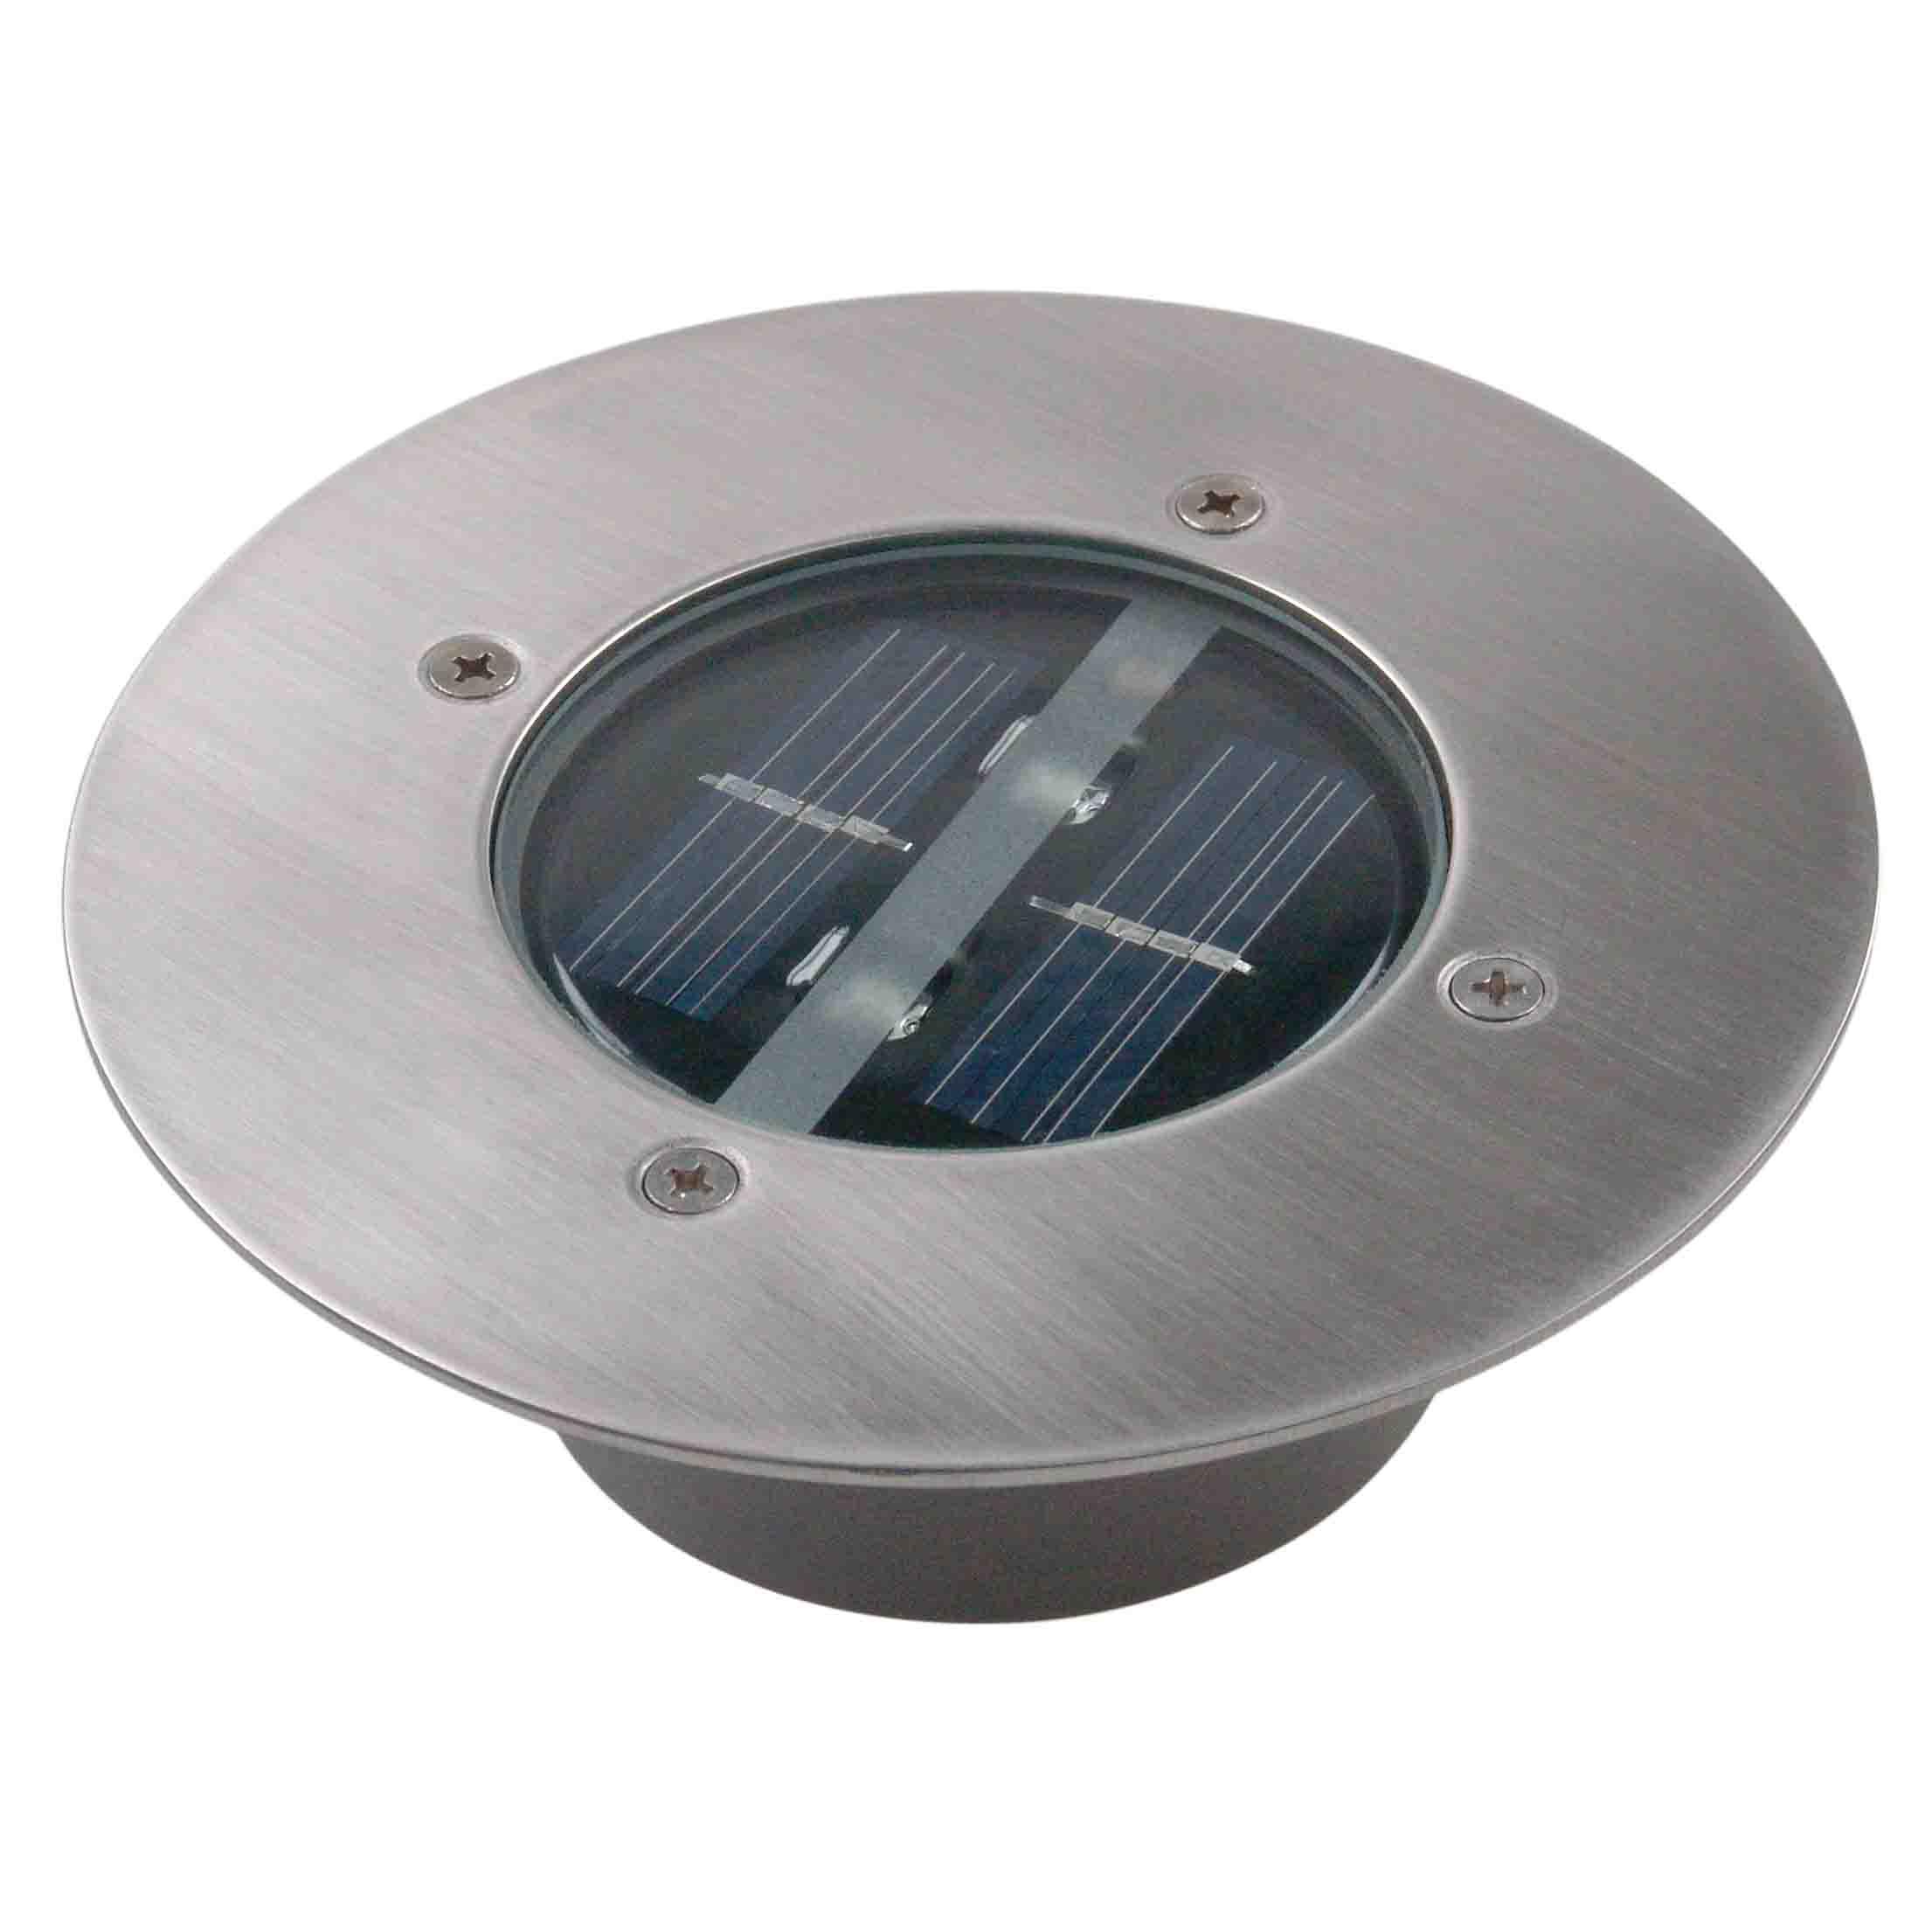 Ranex 'Carlo' Solar LED Bodeneinbaustrahler, ...